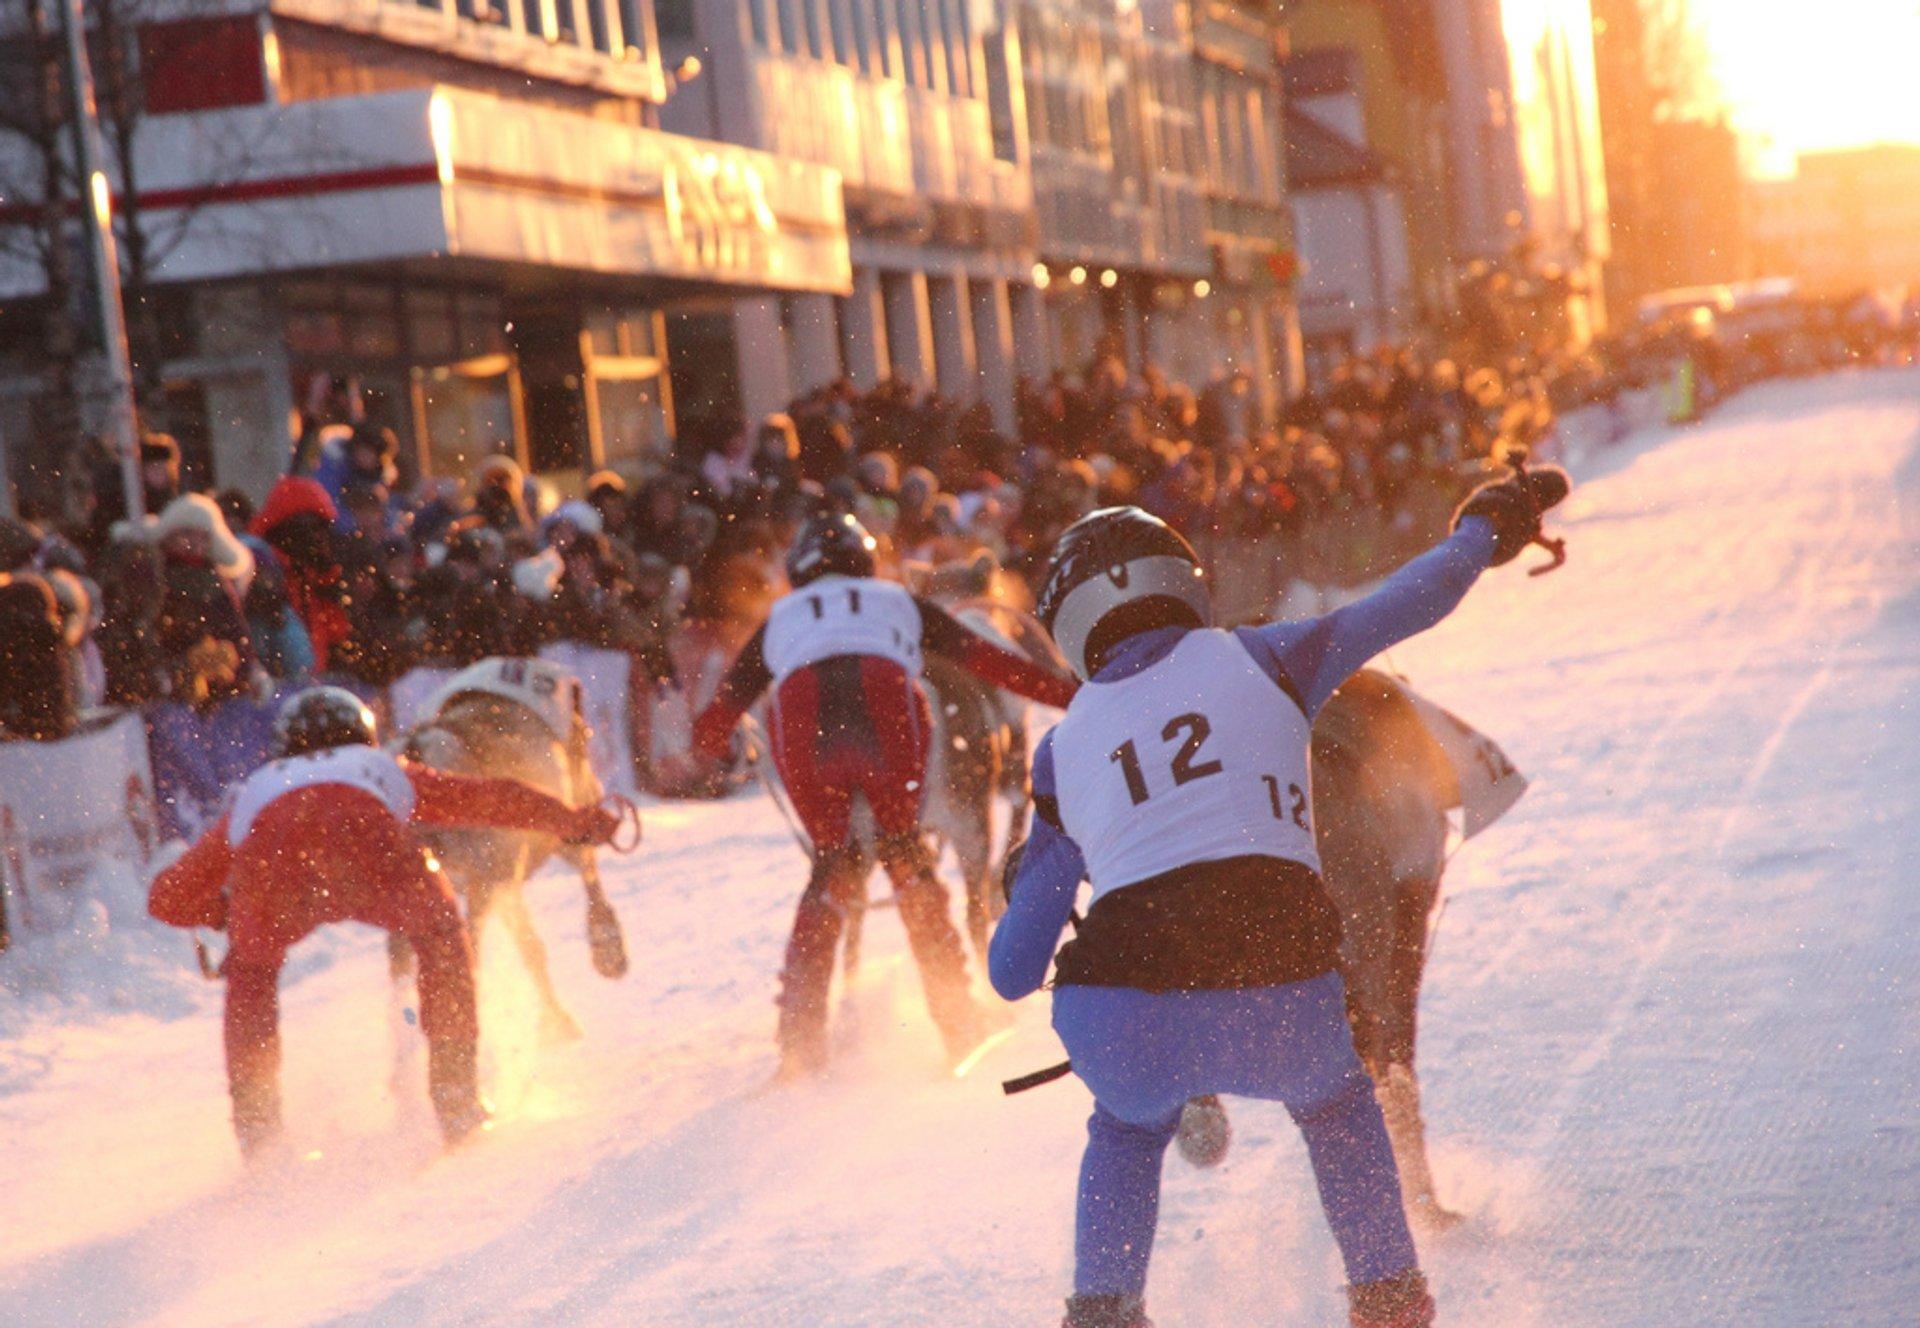 World Reindeer Racing Championships in Norway - Best Season